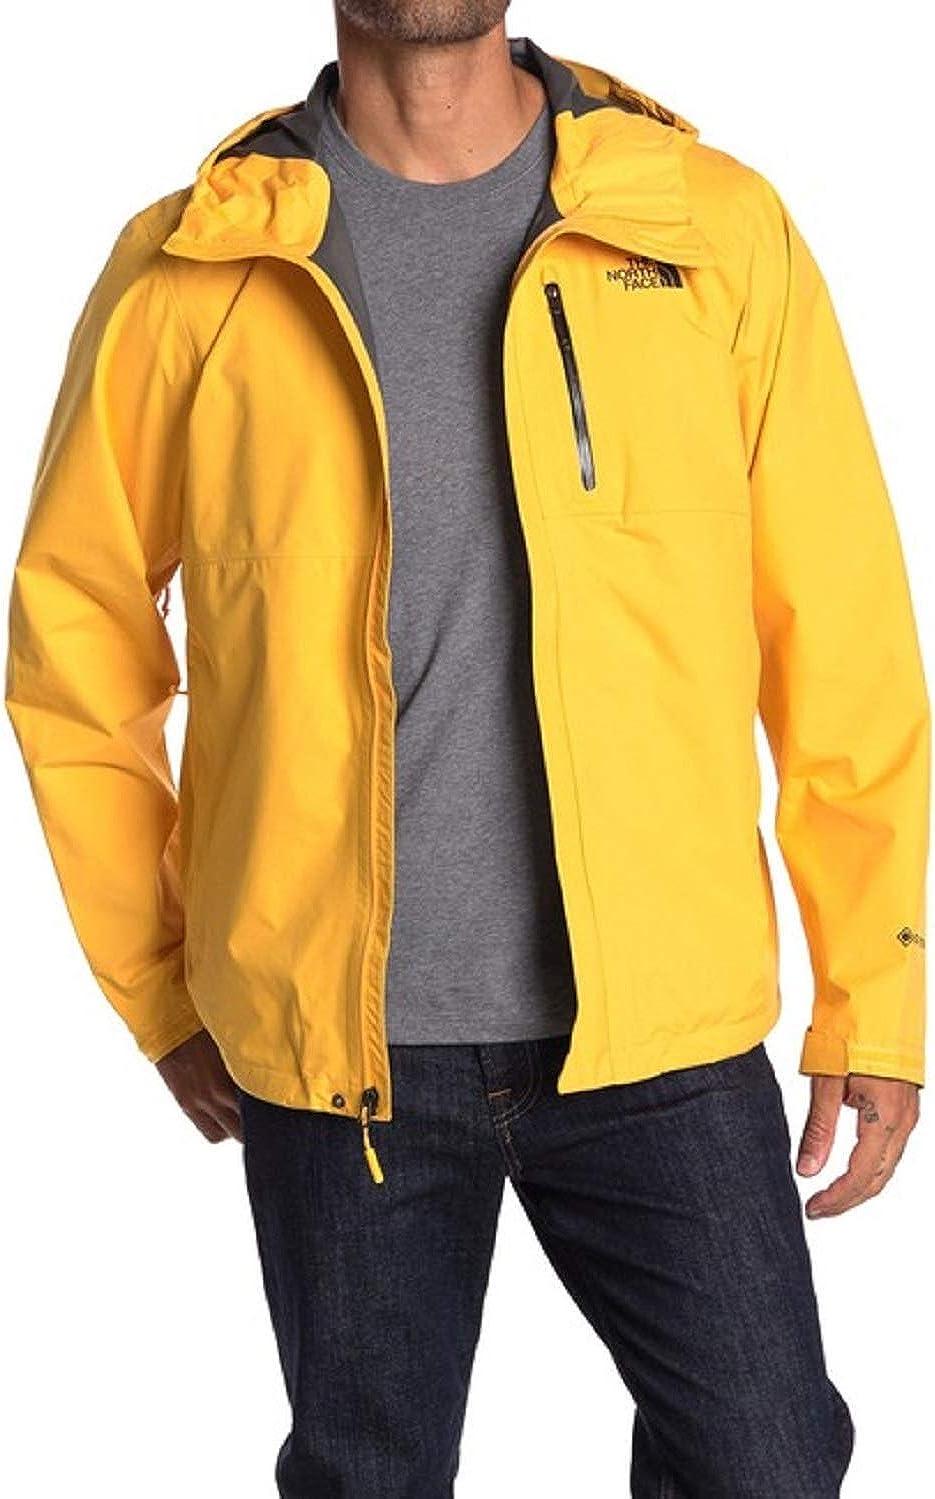 The North Face Dryzzle FUTURELIGHT Jacket